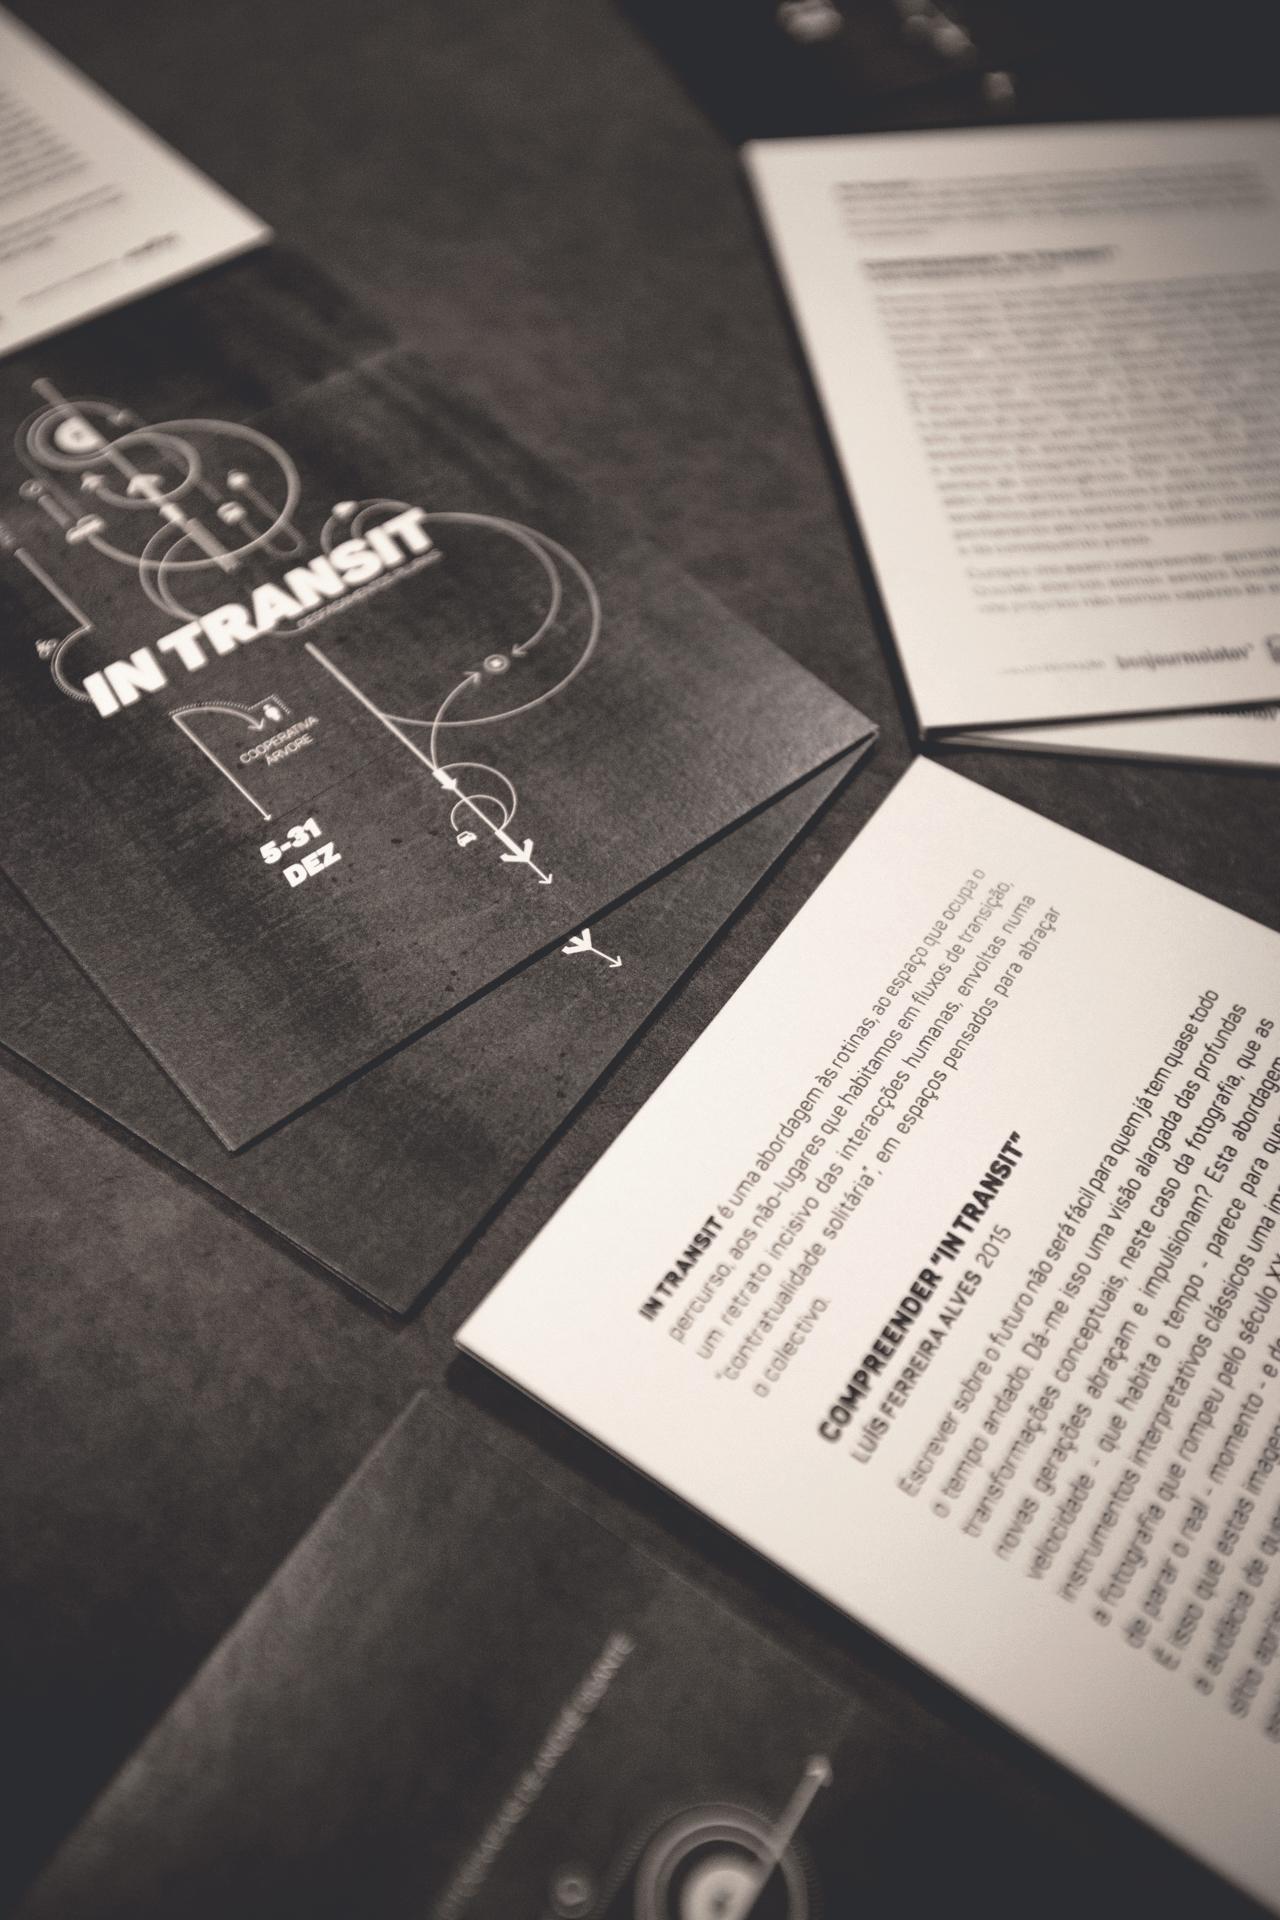 In+Transit+bonjourmolotov+André+Gigante+Experimenta+Design+2015+EXD15+Photography+Exhibition+Exposição+Fotografia+Cooperativa+Árvore+17 N3.jpg